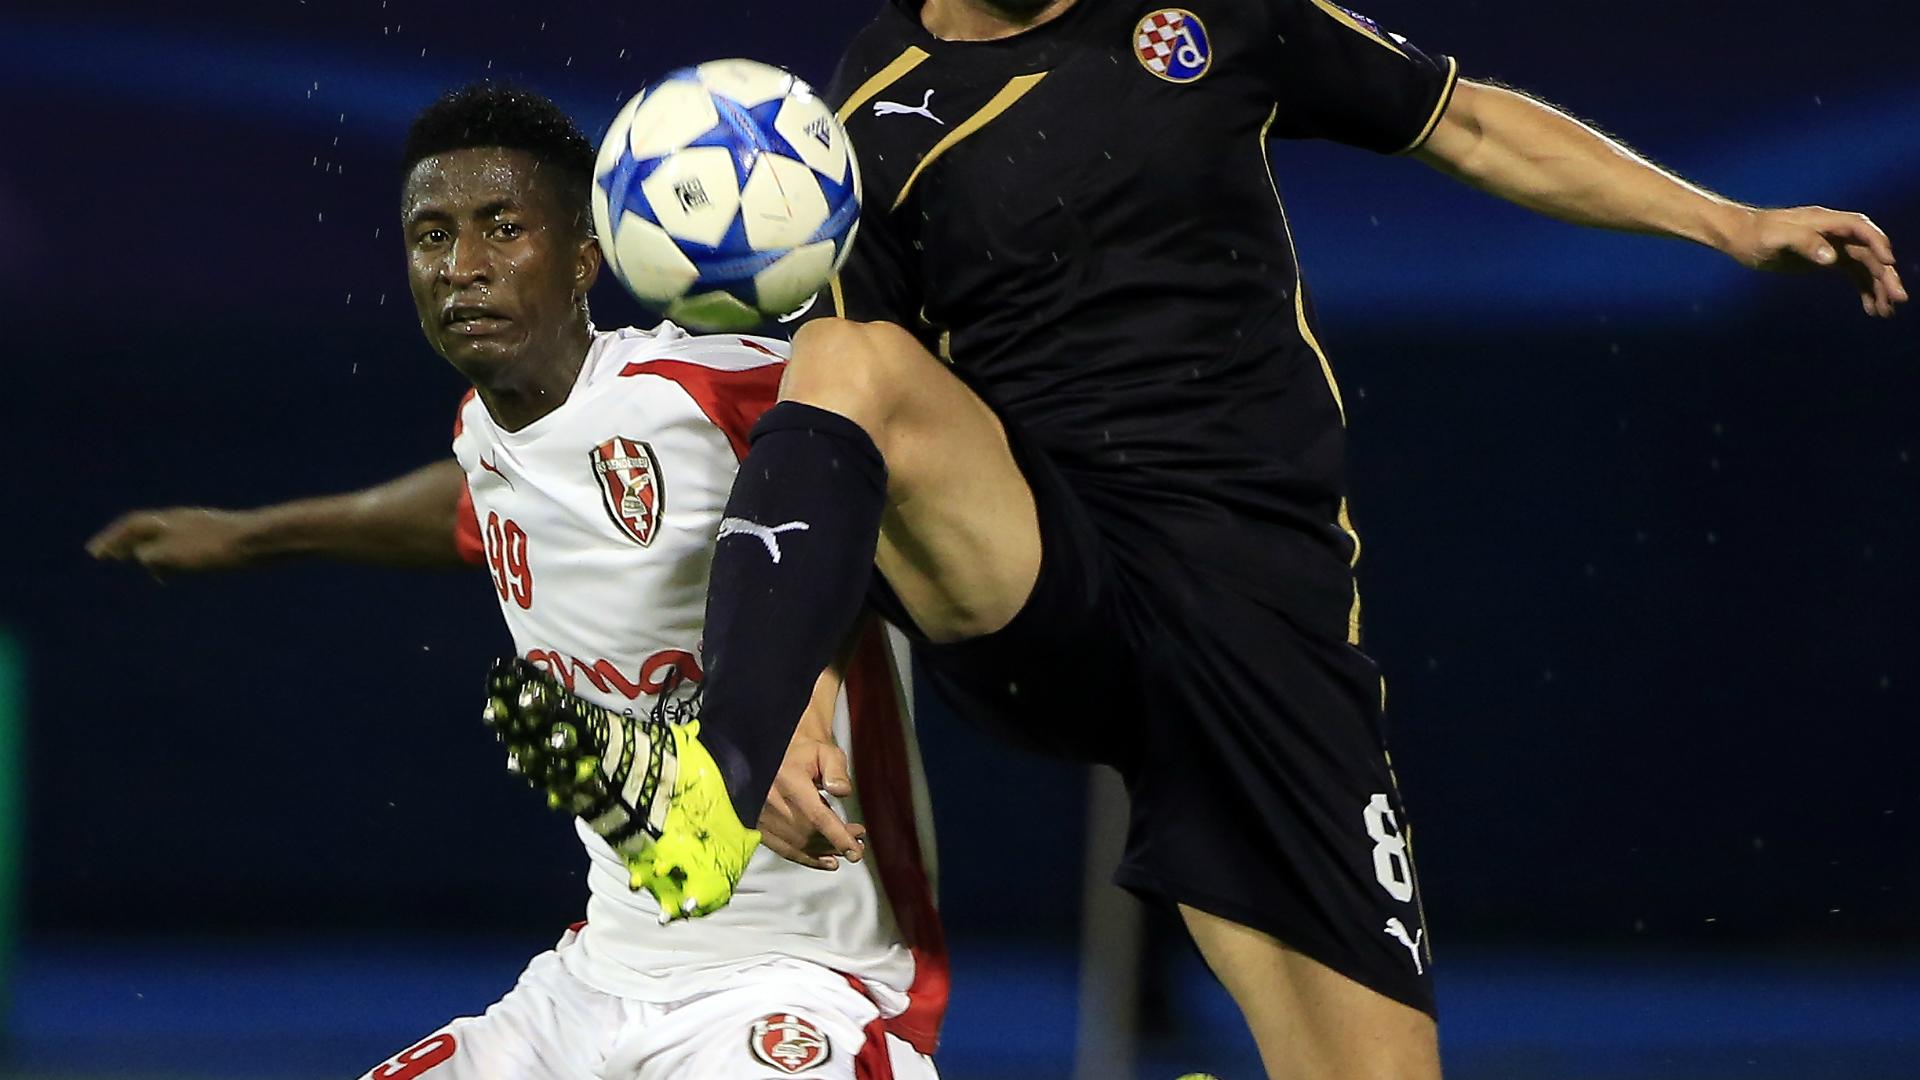 Olayinka scores, Attal shines, Boudaoui sent off as Slavia Prague see off Nice